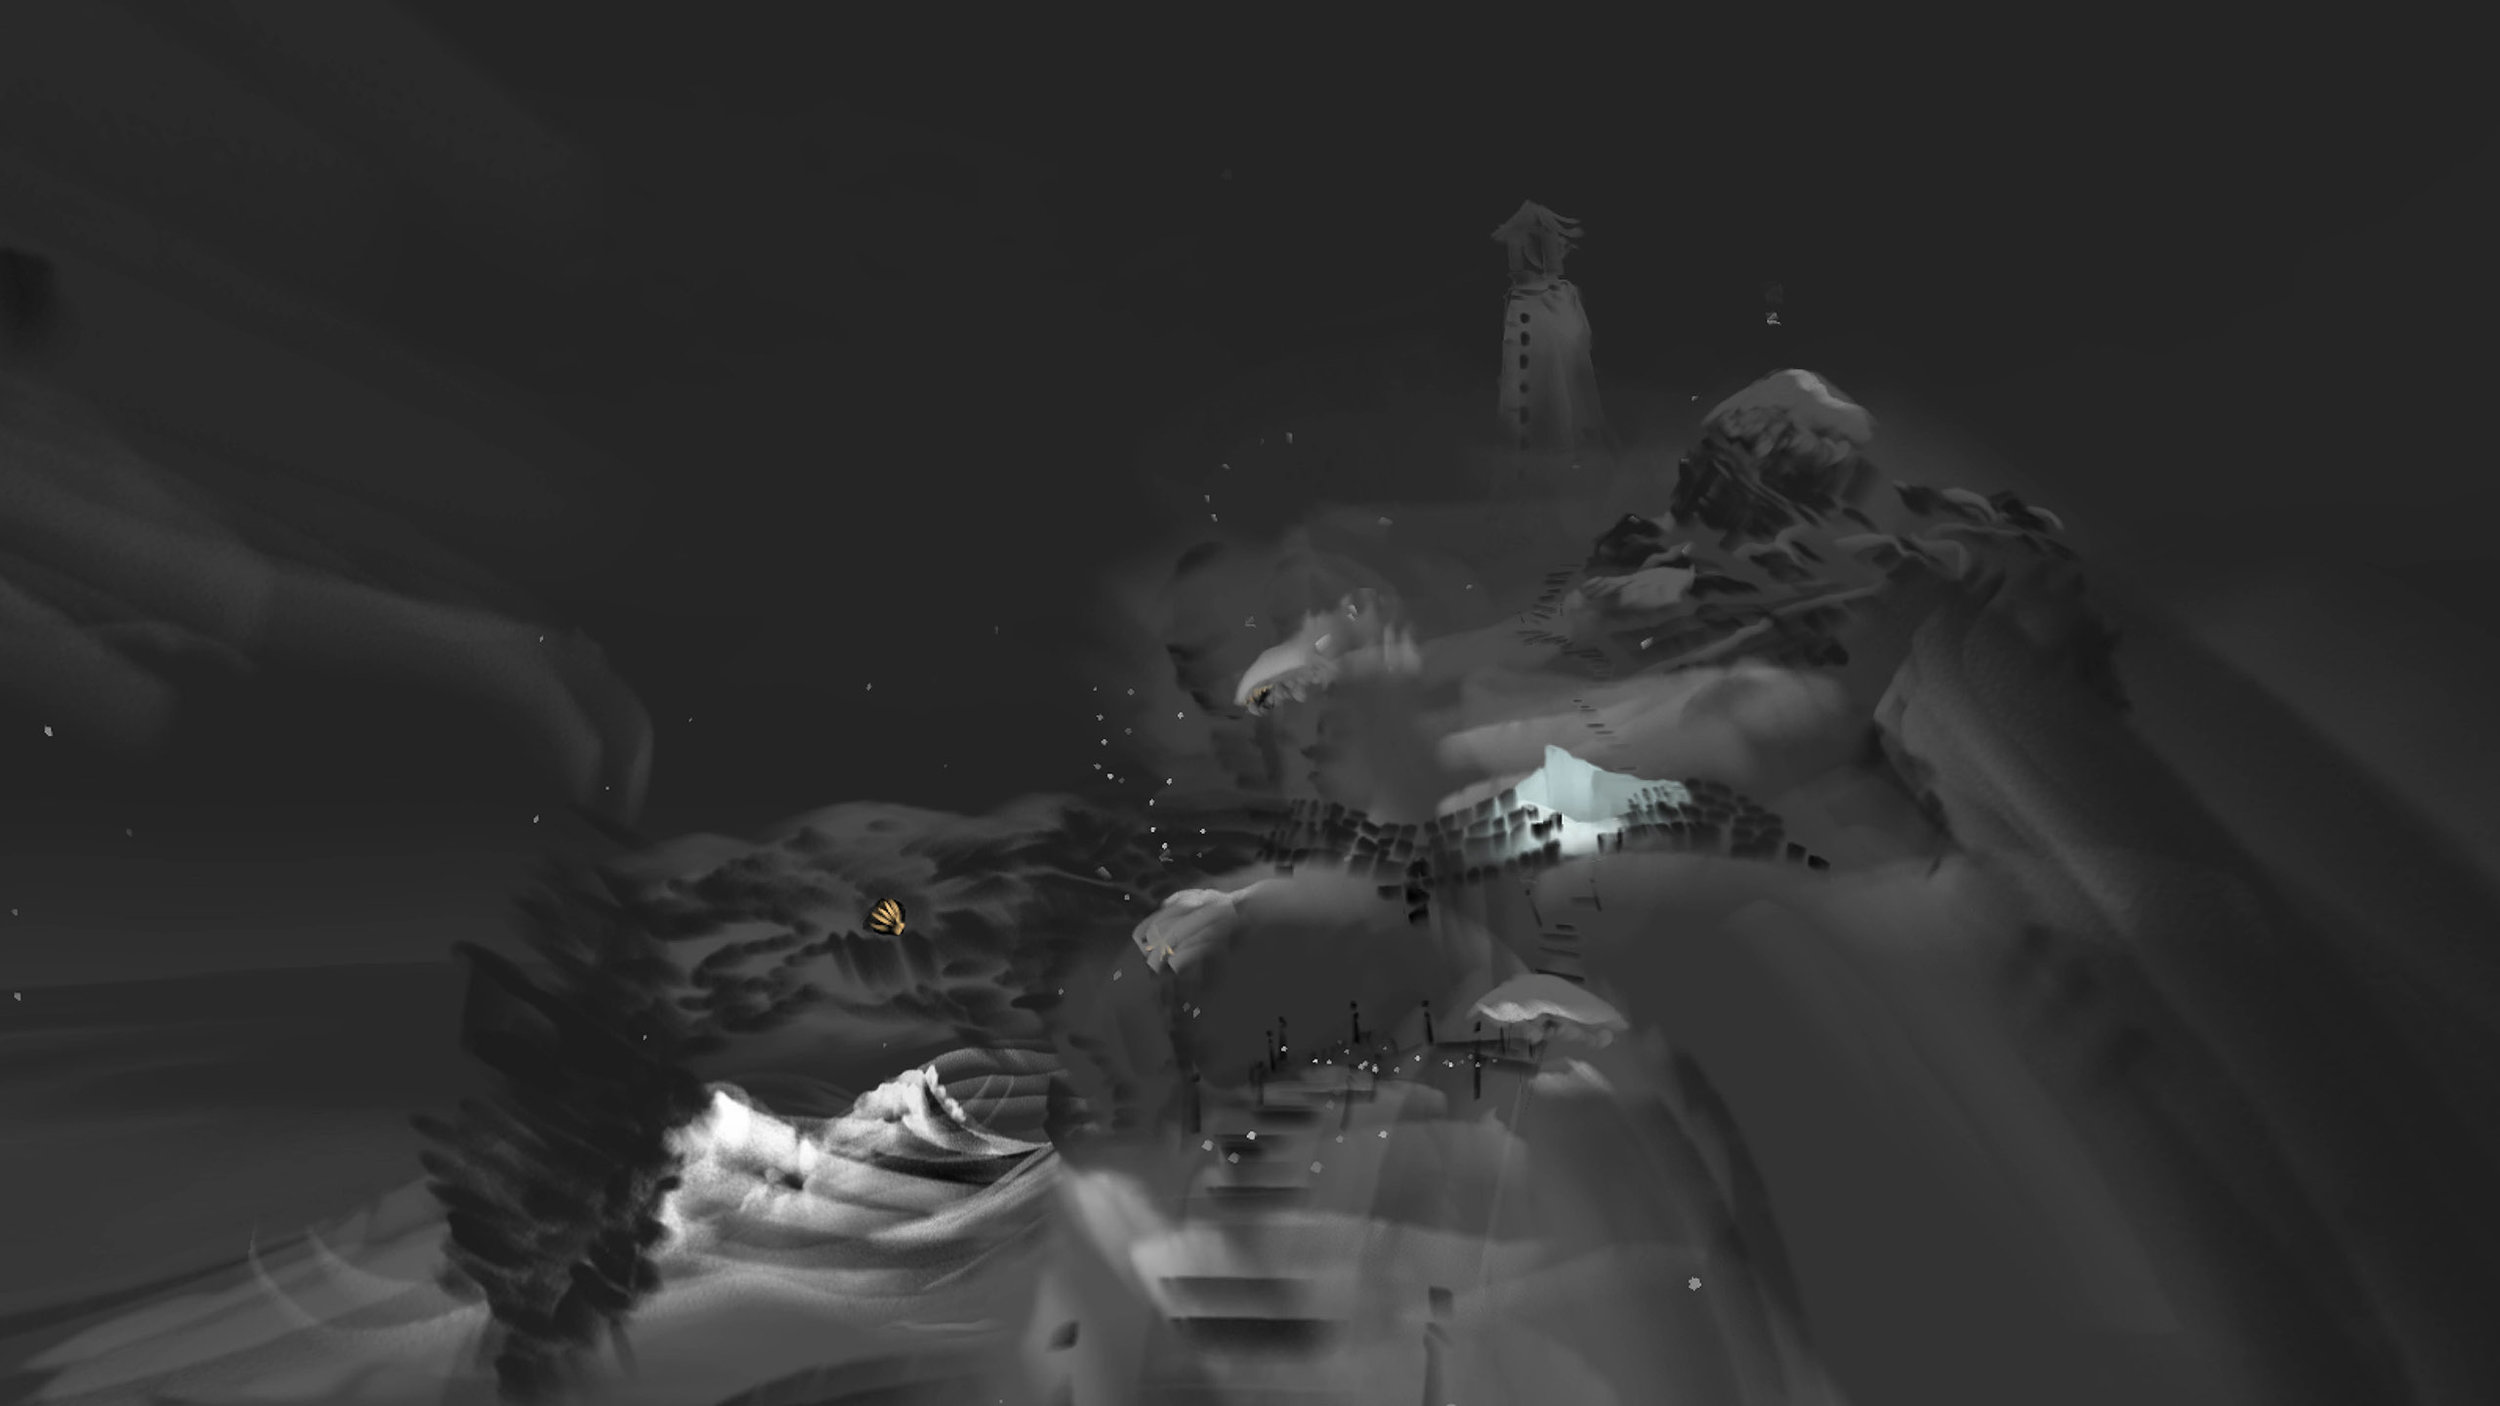 Mirages of Winter The Lighthouse Screenshot 1440p.jpg